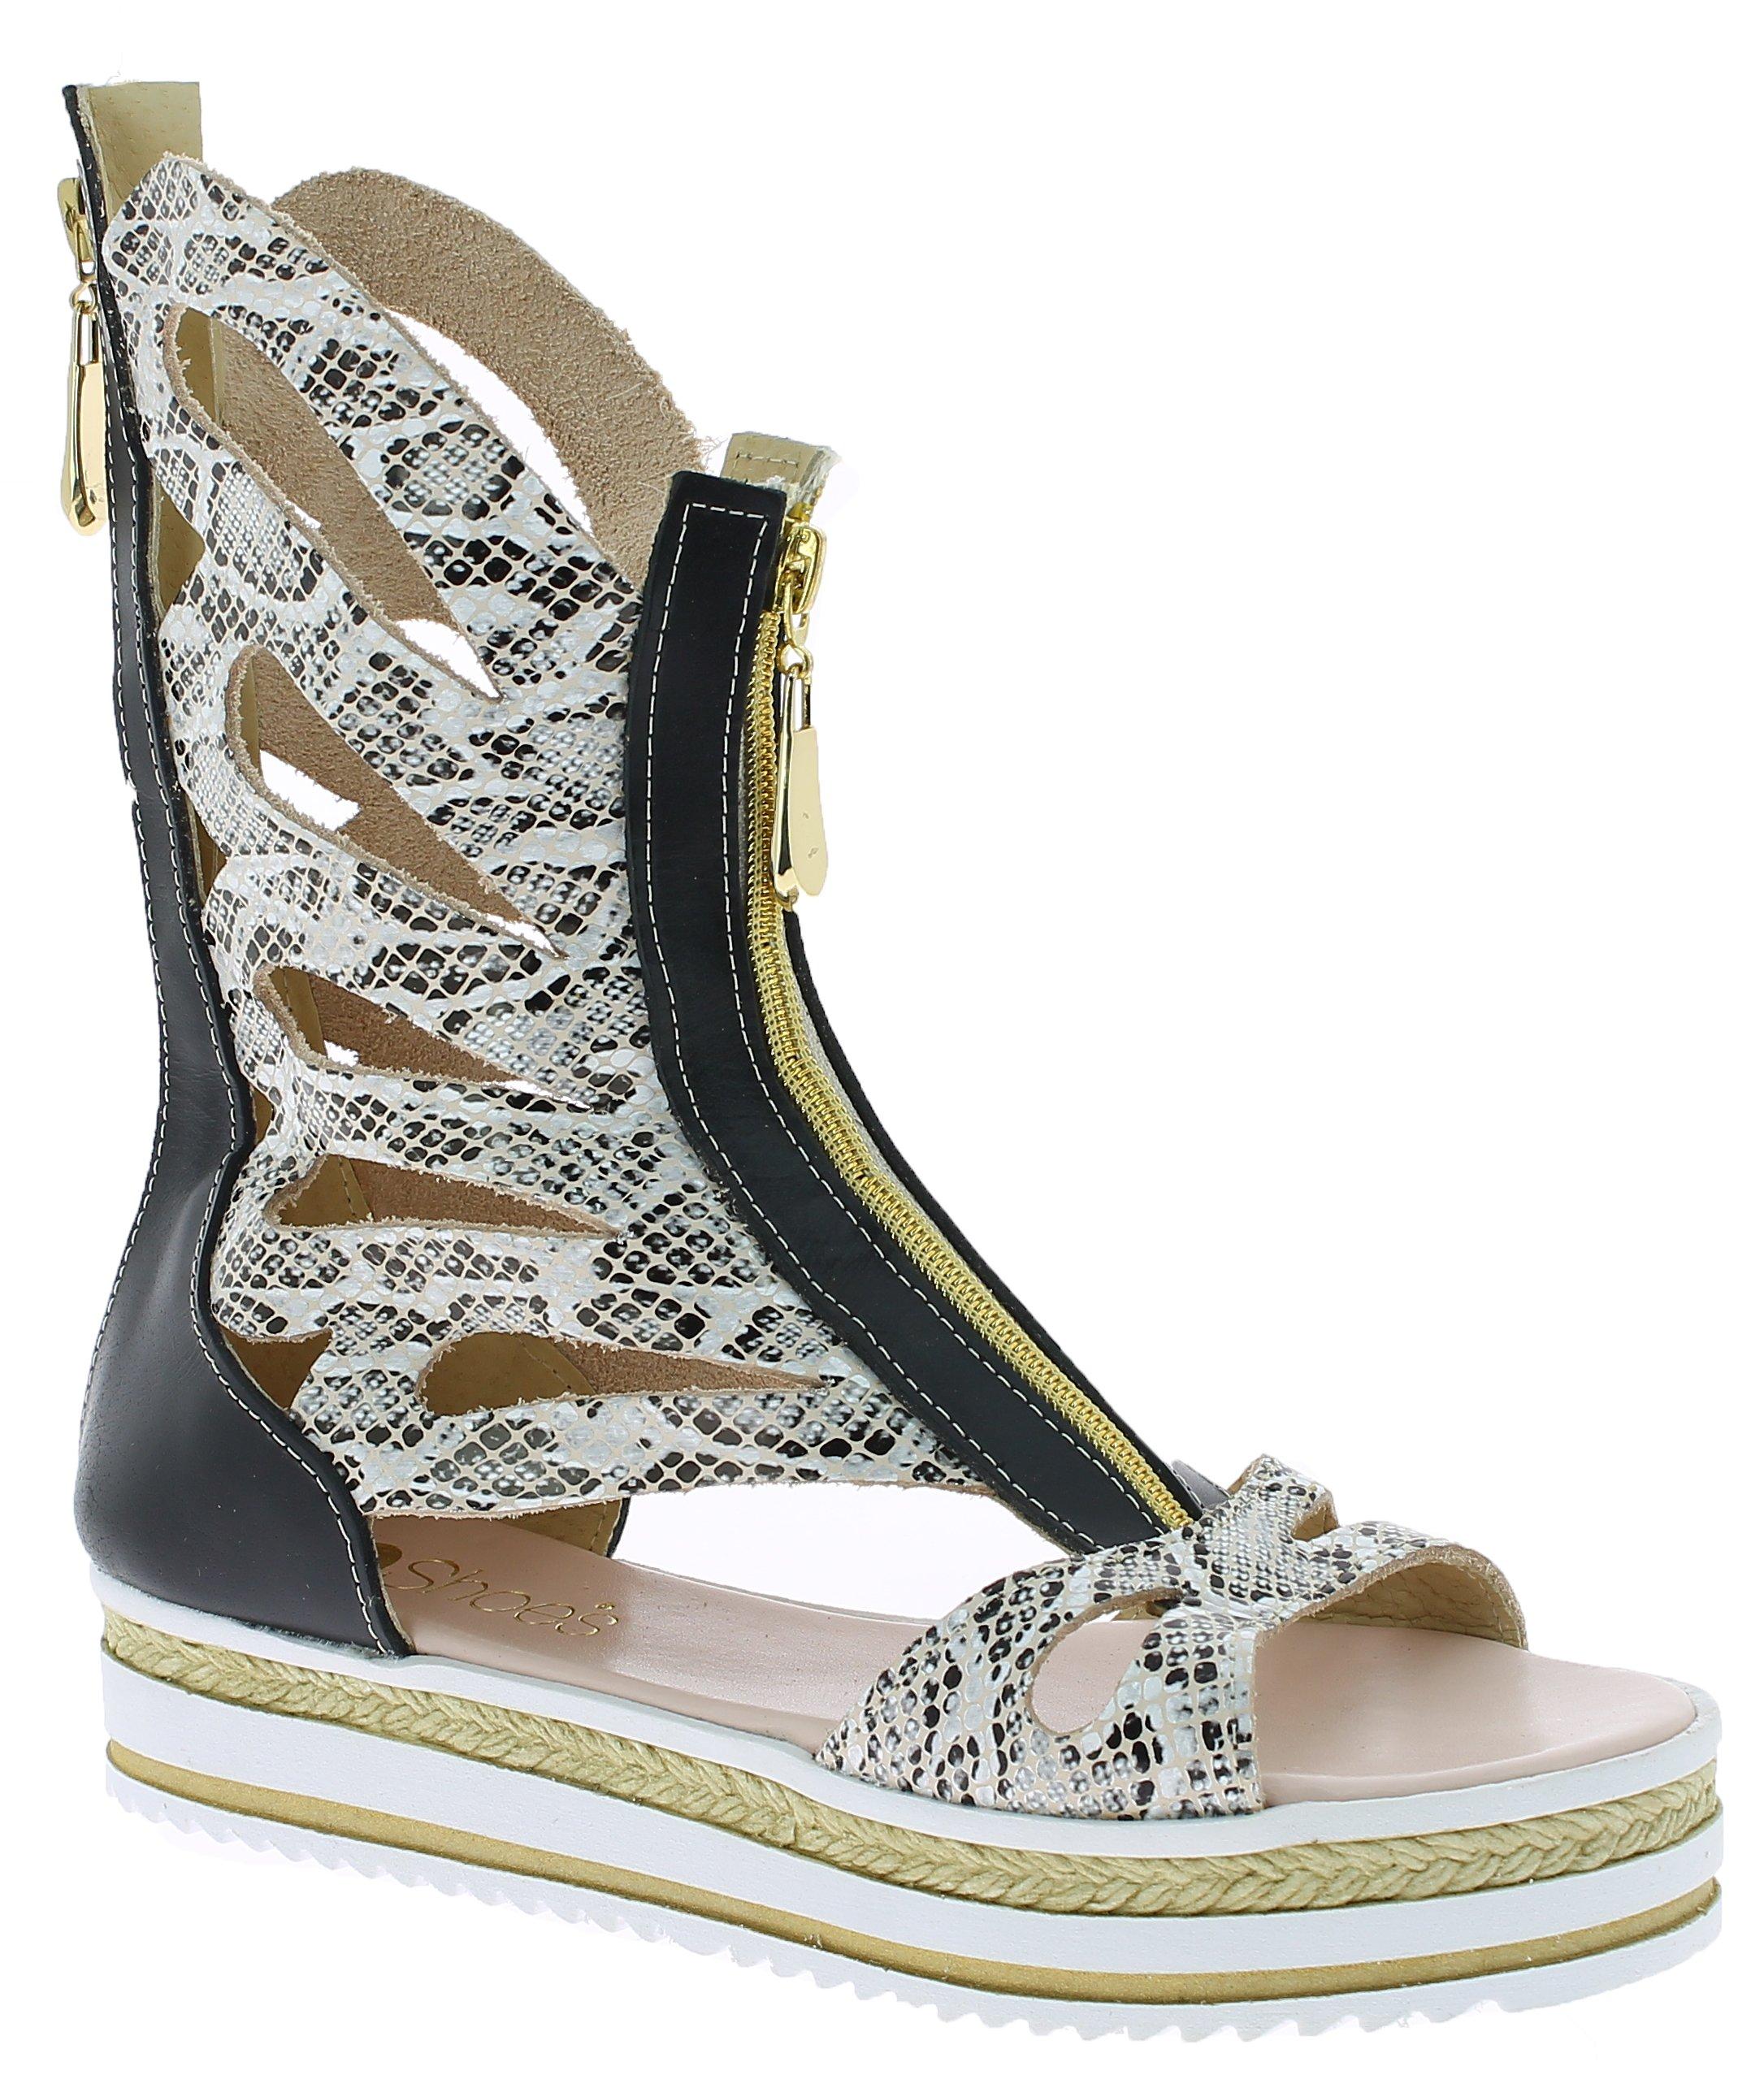 IQSHOES Γυναικείο Πέδιλο B23T Μαύρο - IqShoes - 50.B23T black-black-36/1/15/7 παπούτσια  προσφορεσ